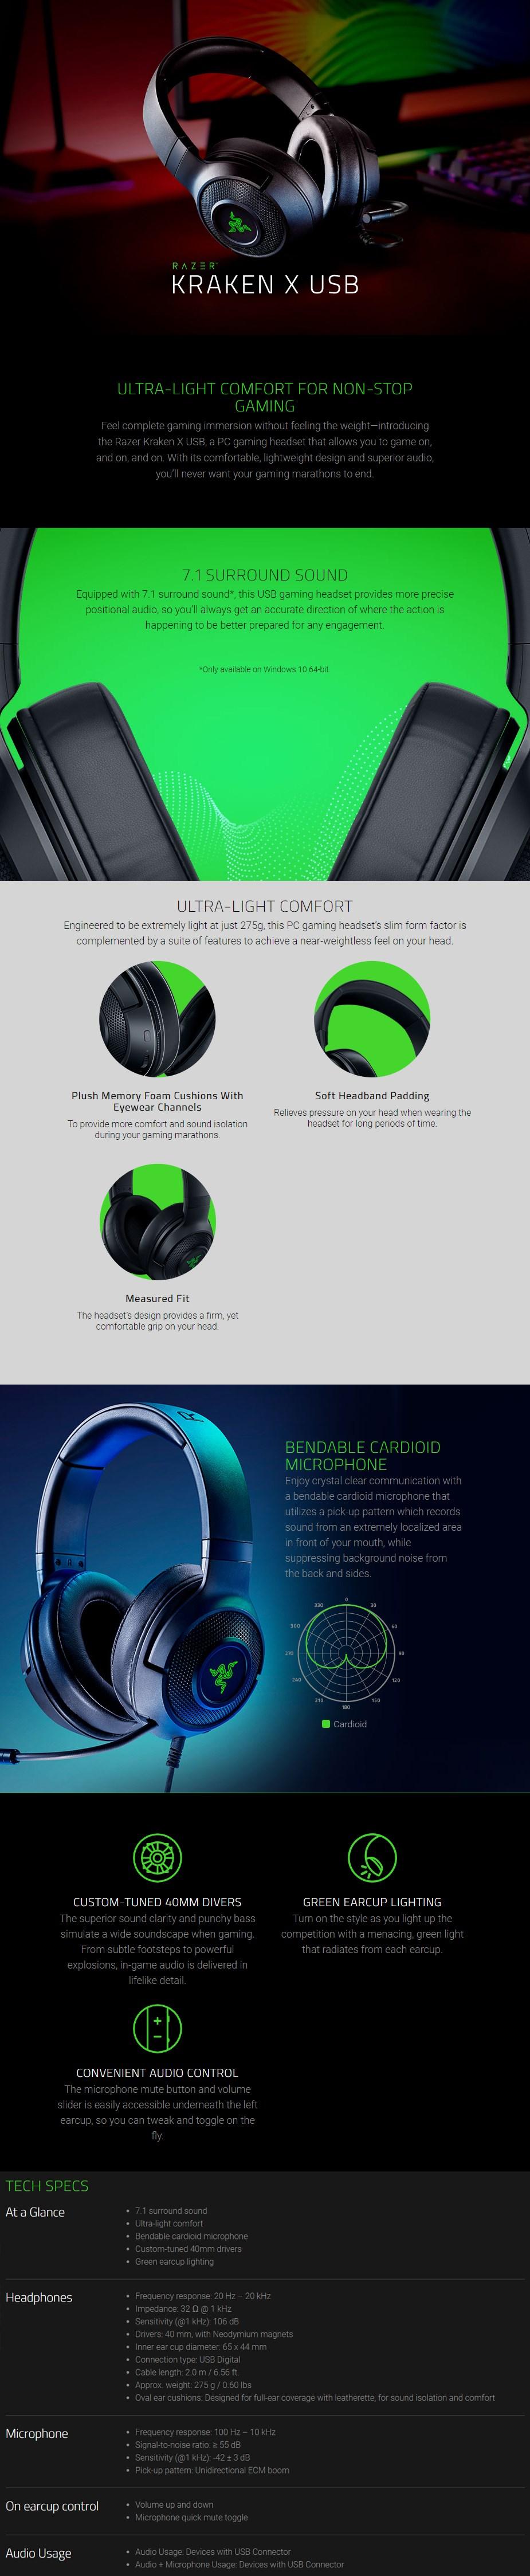 razer-kraken-x-usb-71-surround-sound-gaming-headset-black-ac29729-3.jpg